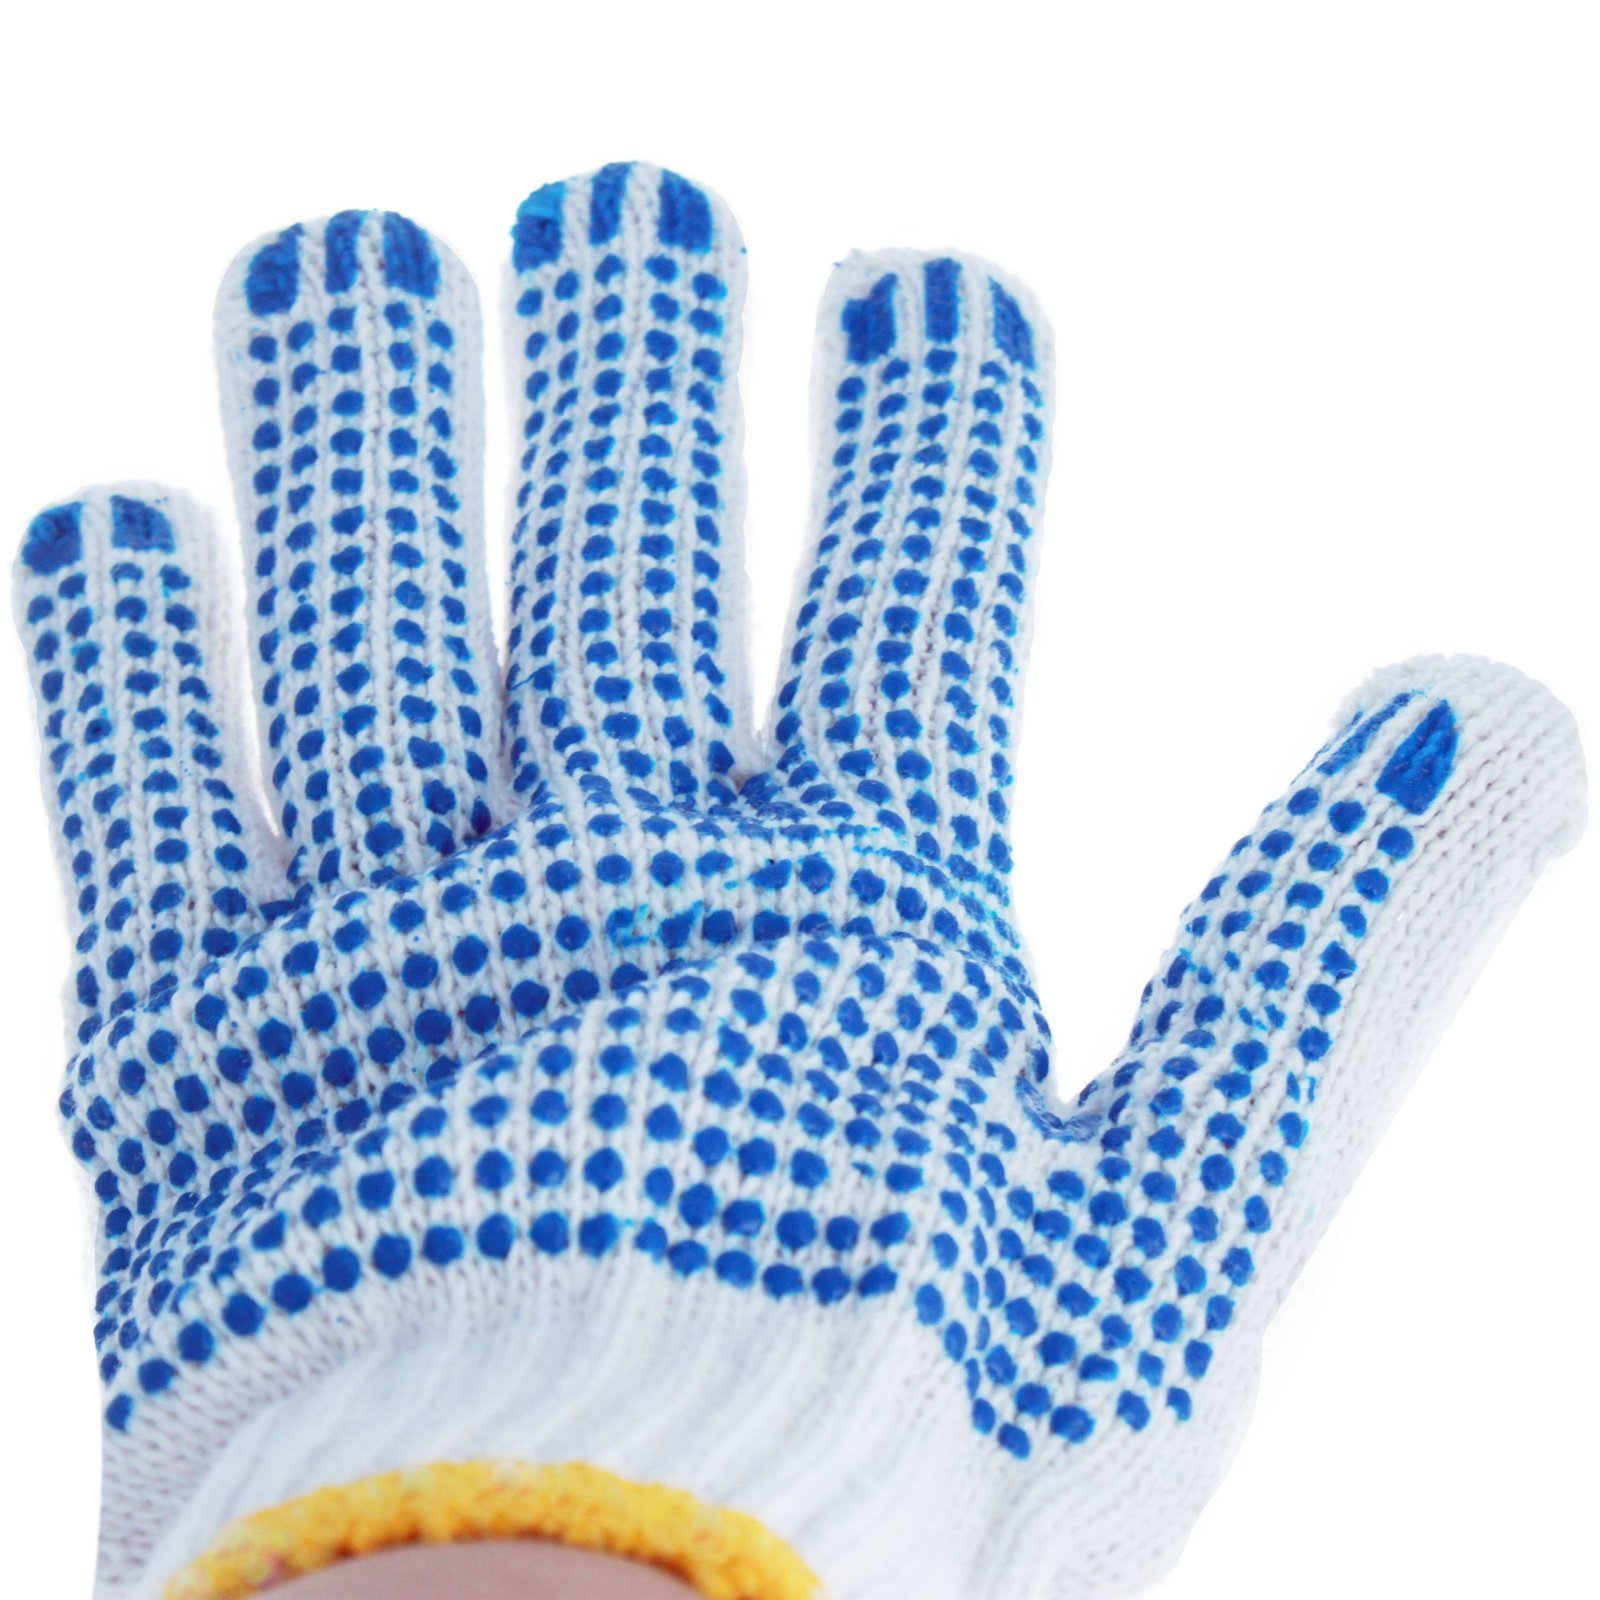 Universal - Dot Grip Non-Slip Gardening Work Gloves - Blue